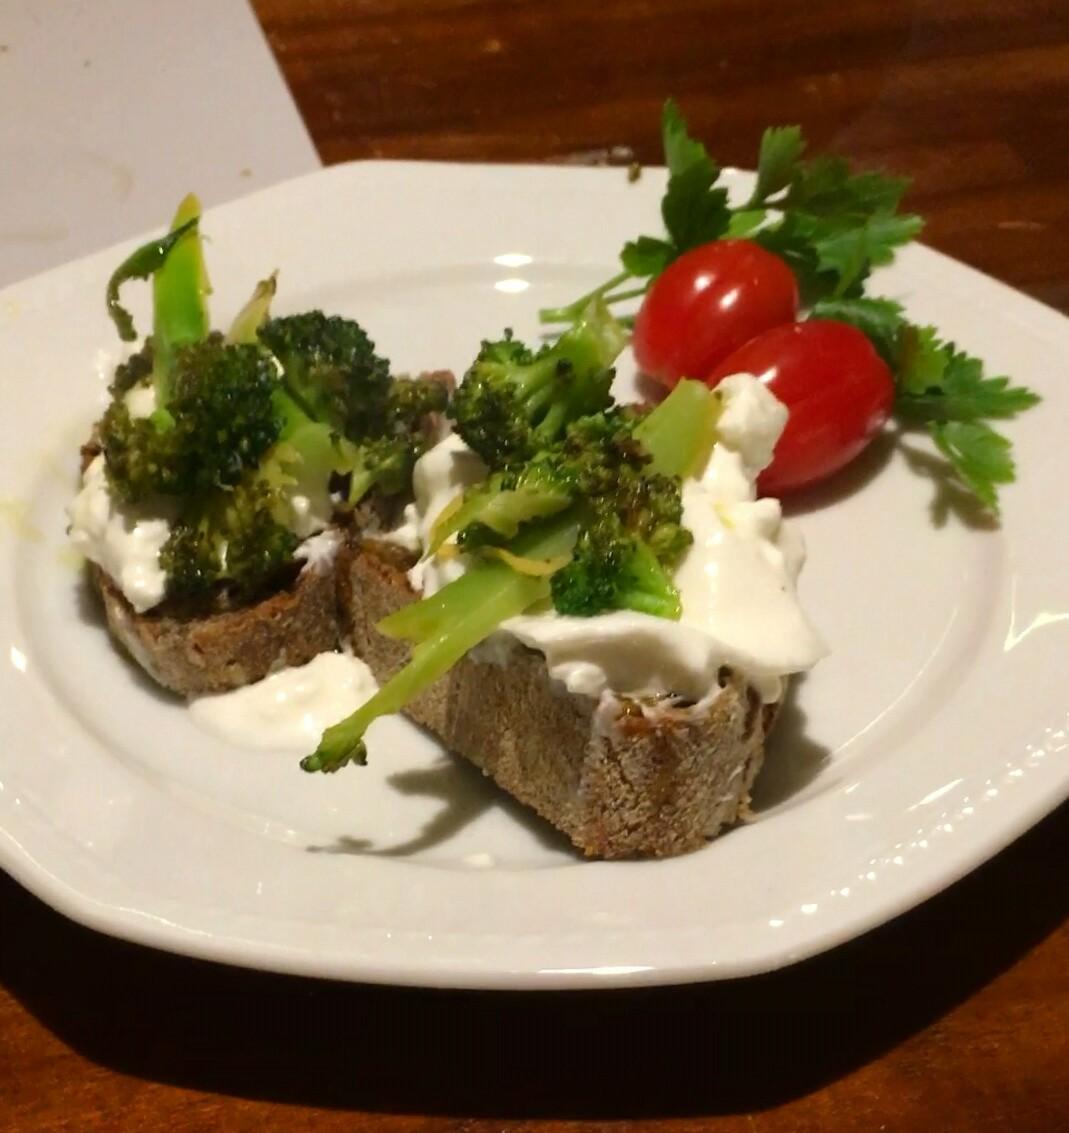 Lækker bruschetta ret med Burrata og broccoli